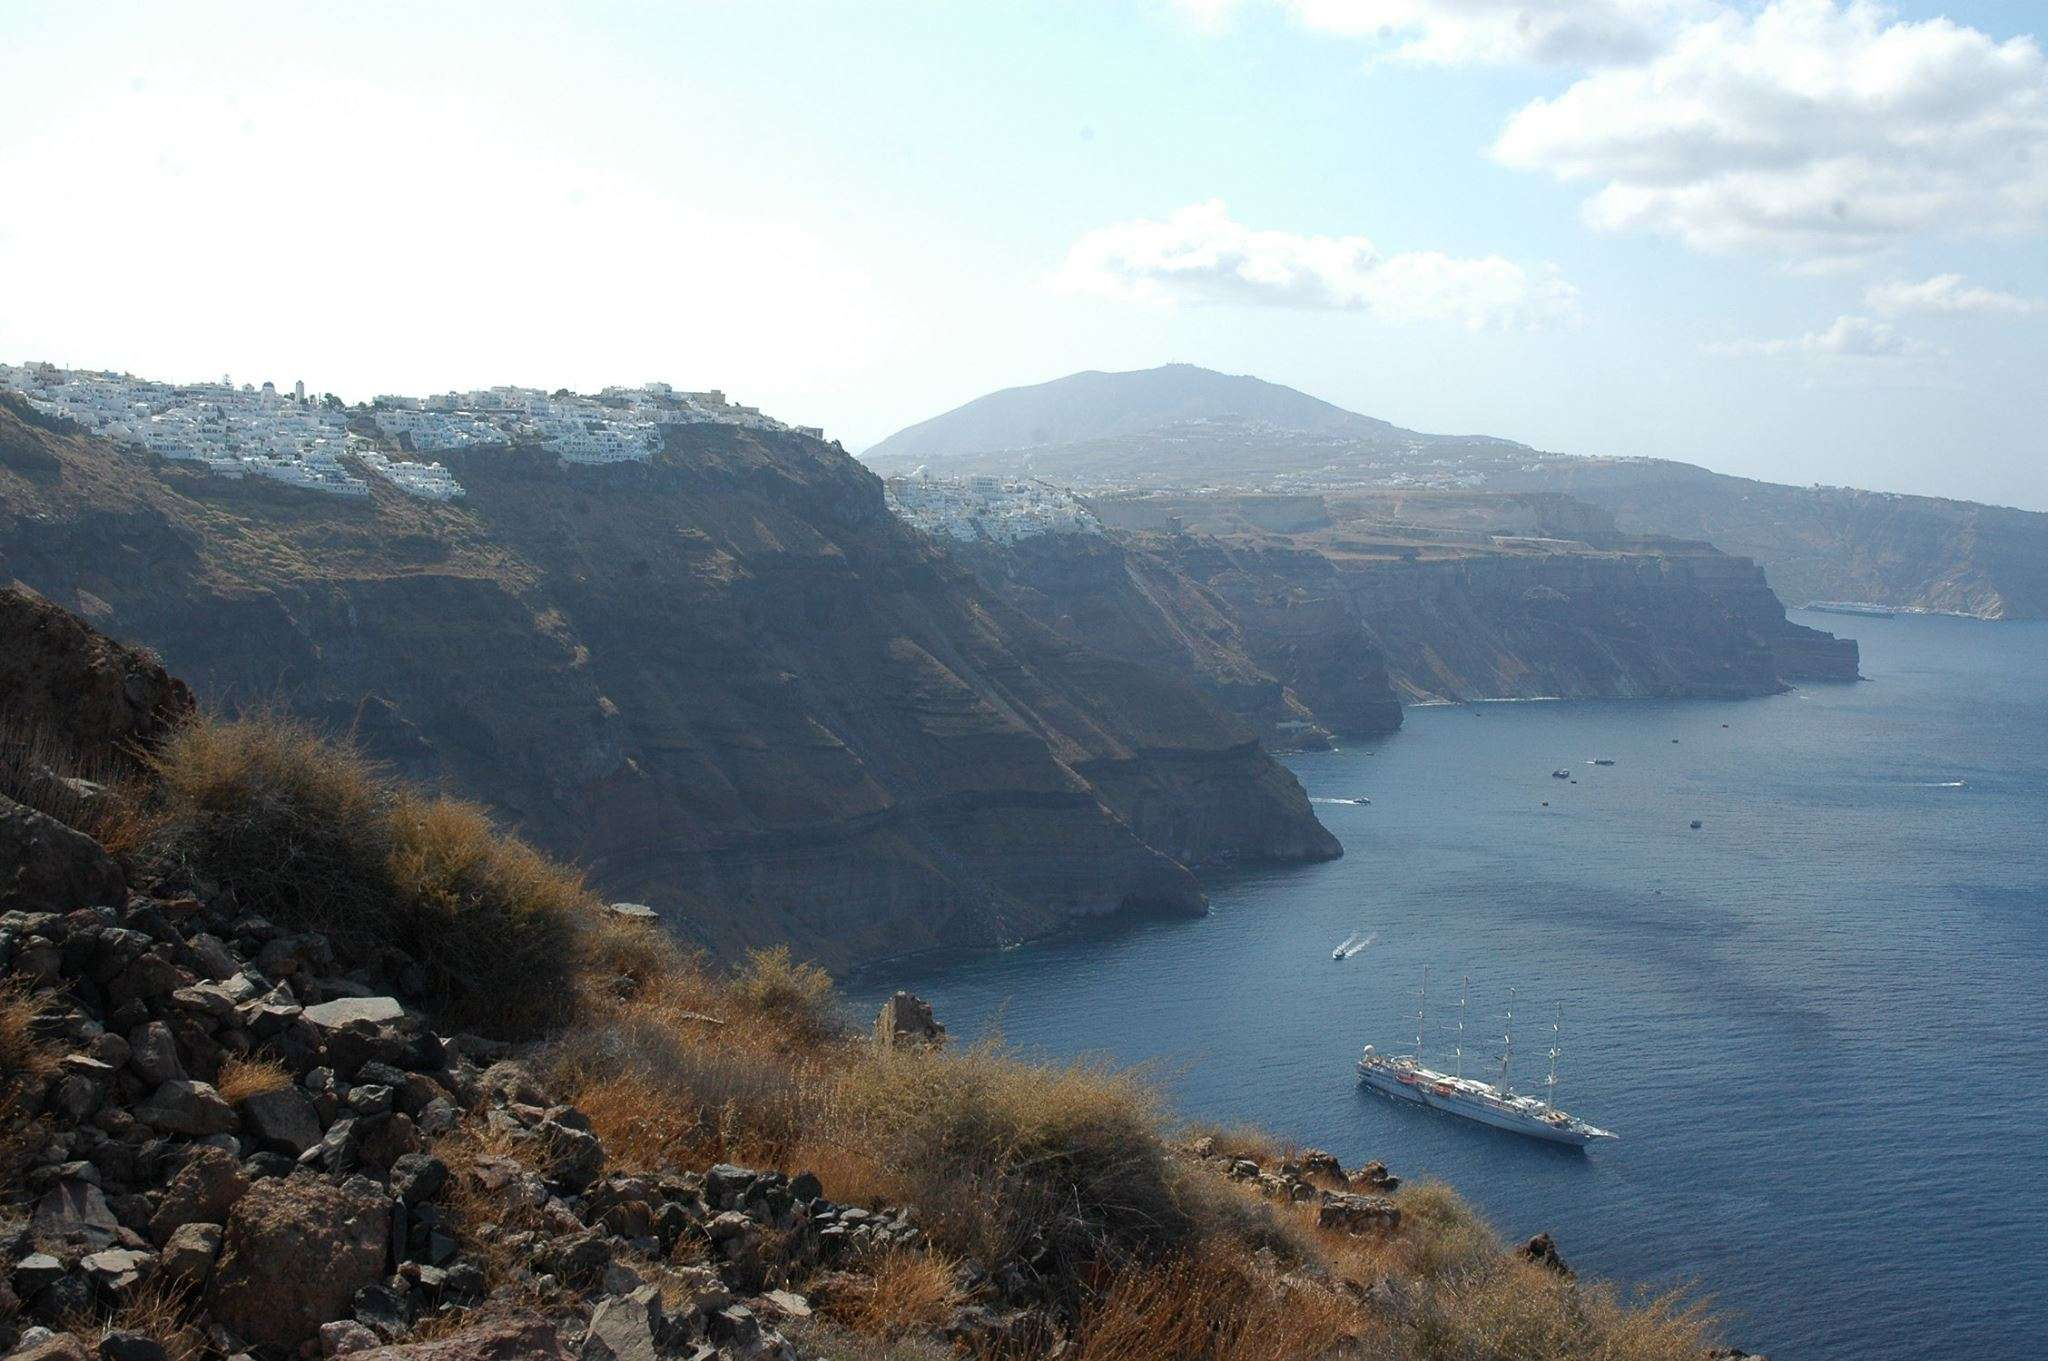 Overlooking Imerovigli, Santorini